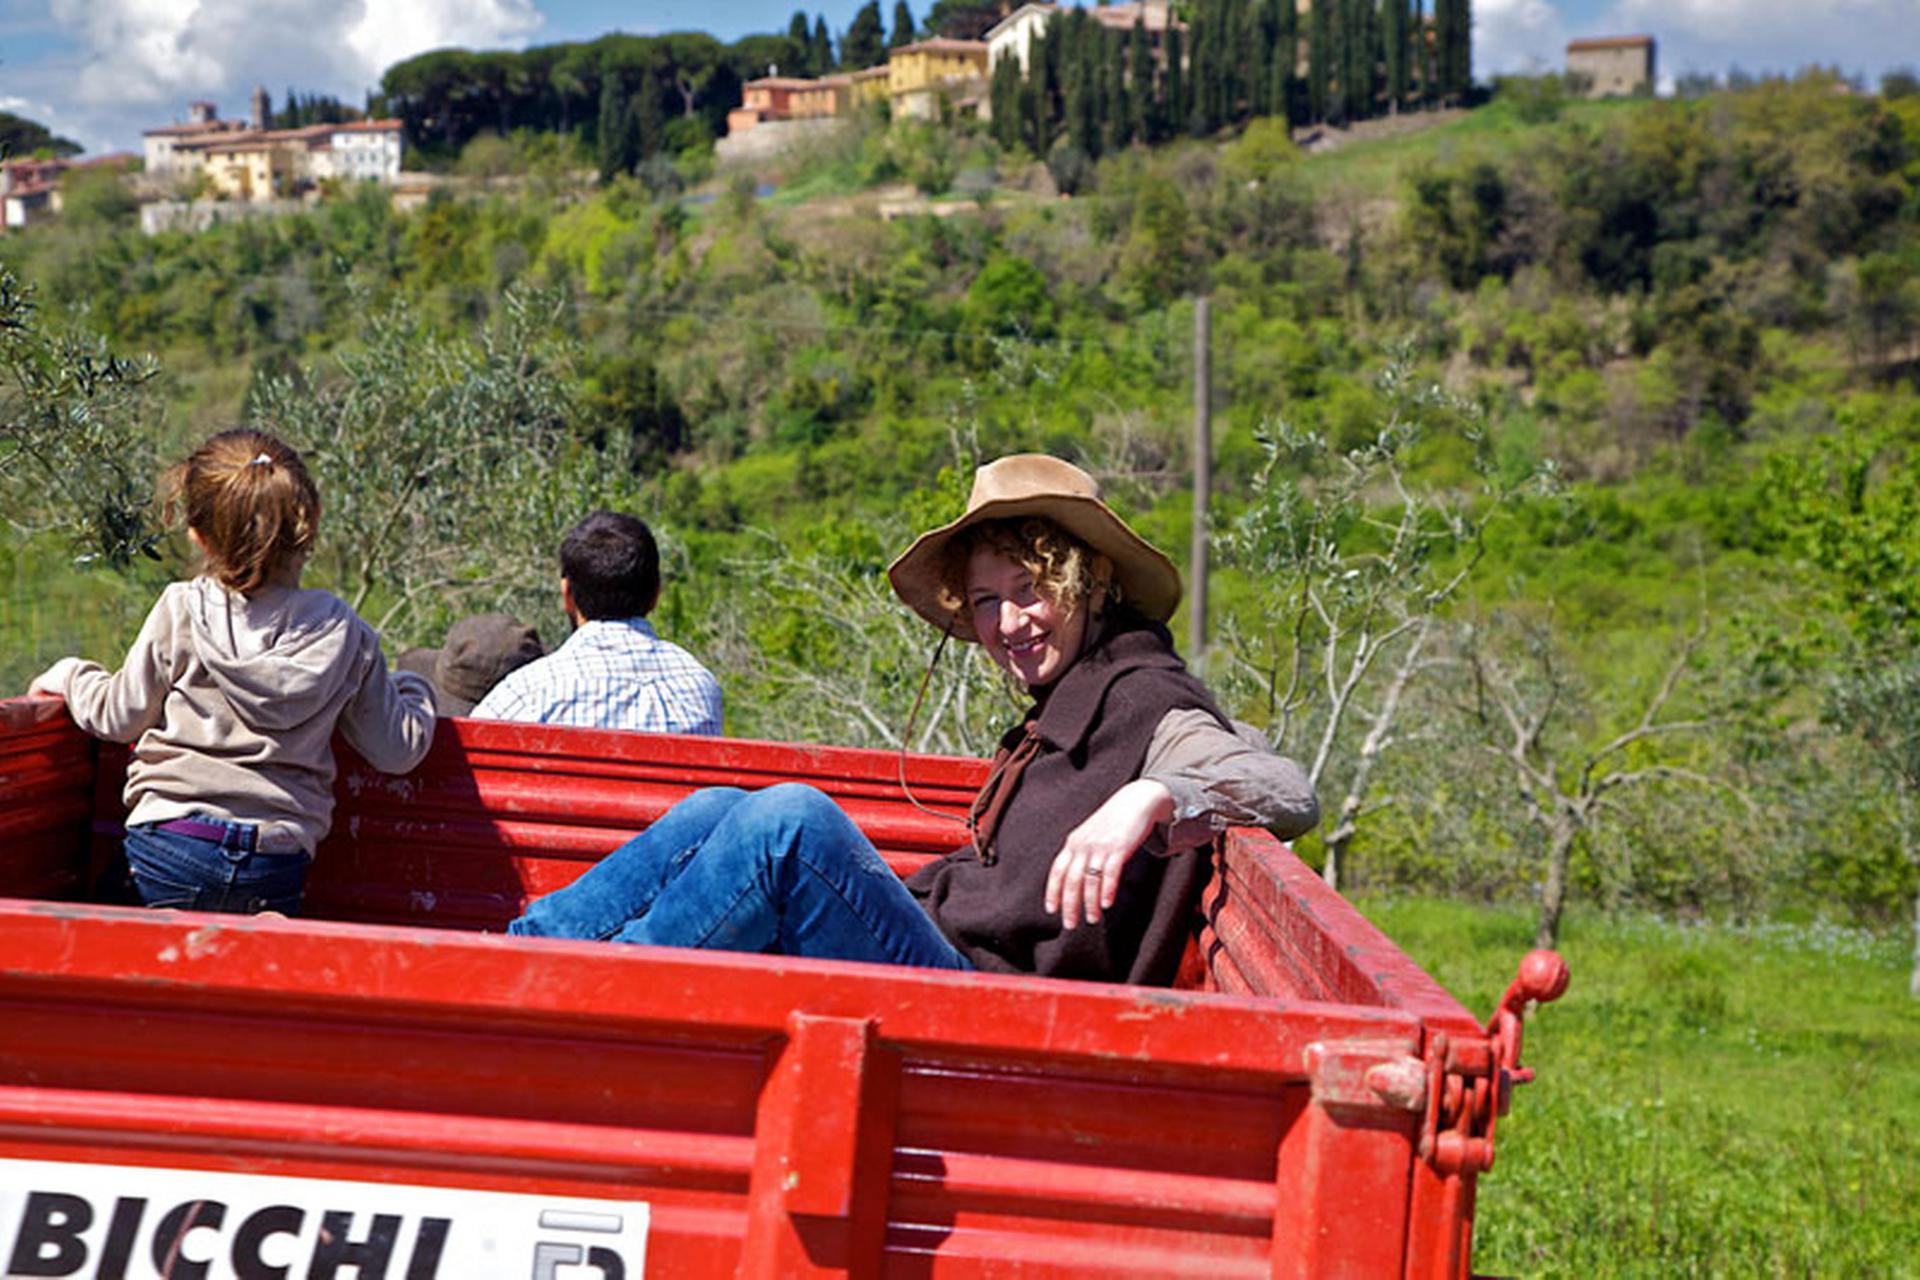 Agriturismo Toscane Gastvrije agriturismo mét heerlijke trattoria | myitaly.nl